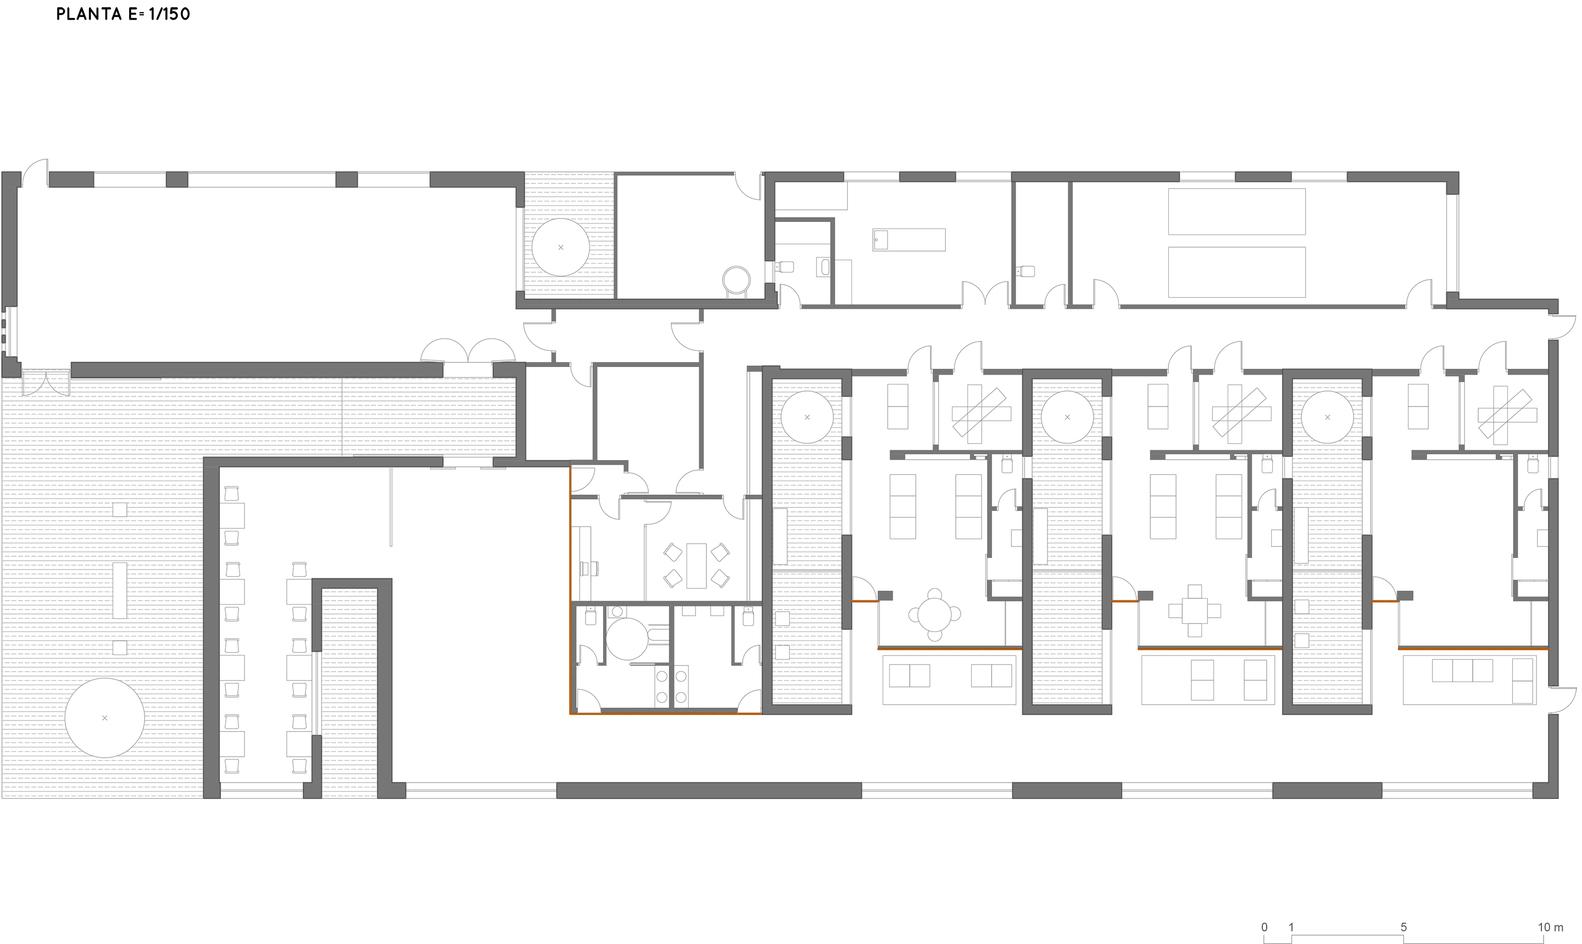 Floor plans funeral homes - Mon Var Funeral Home Ground Floor Plan